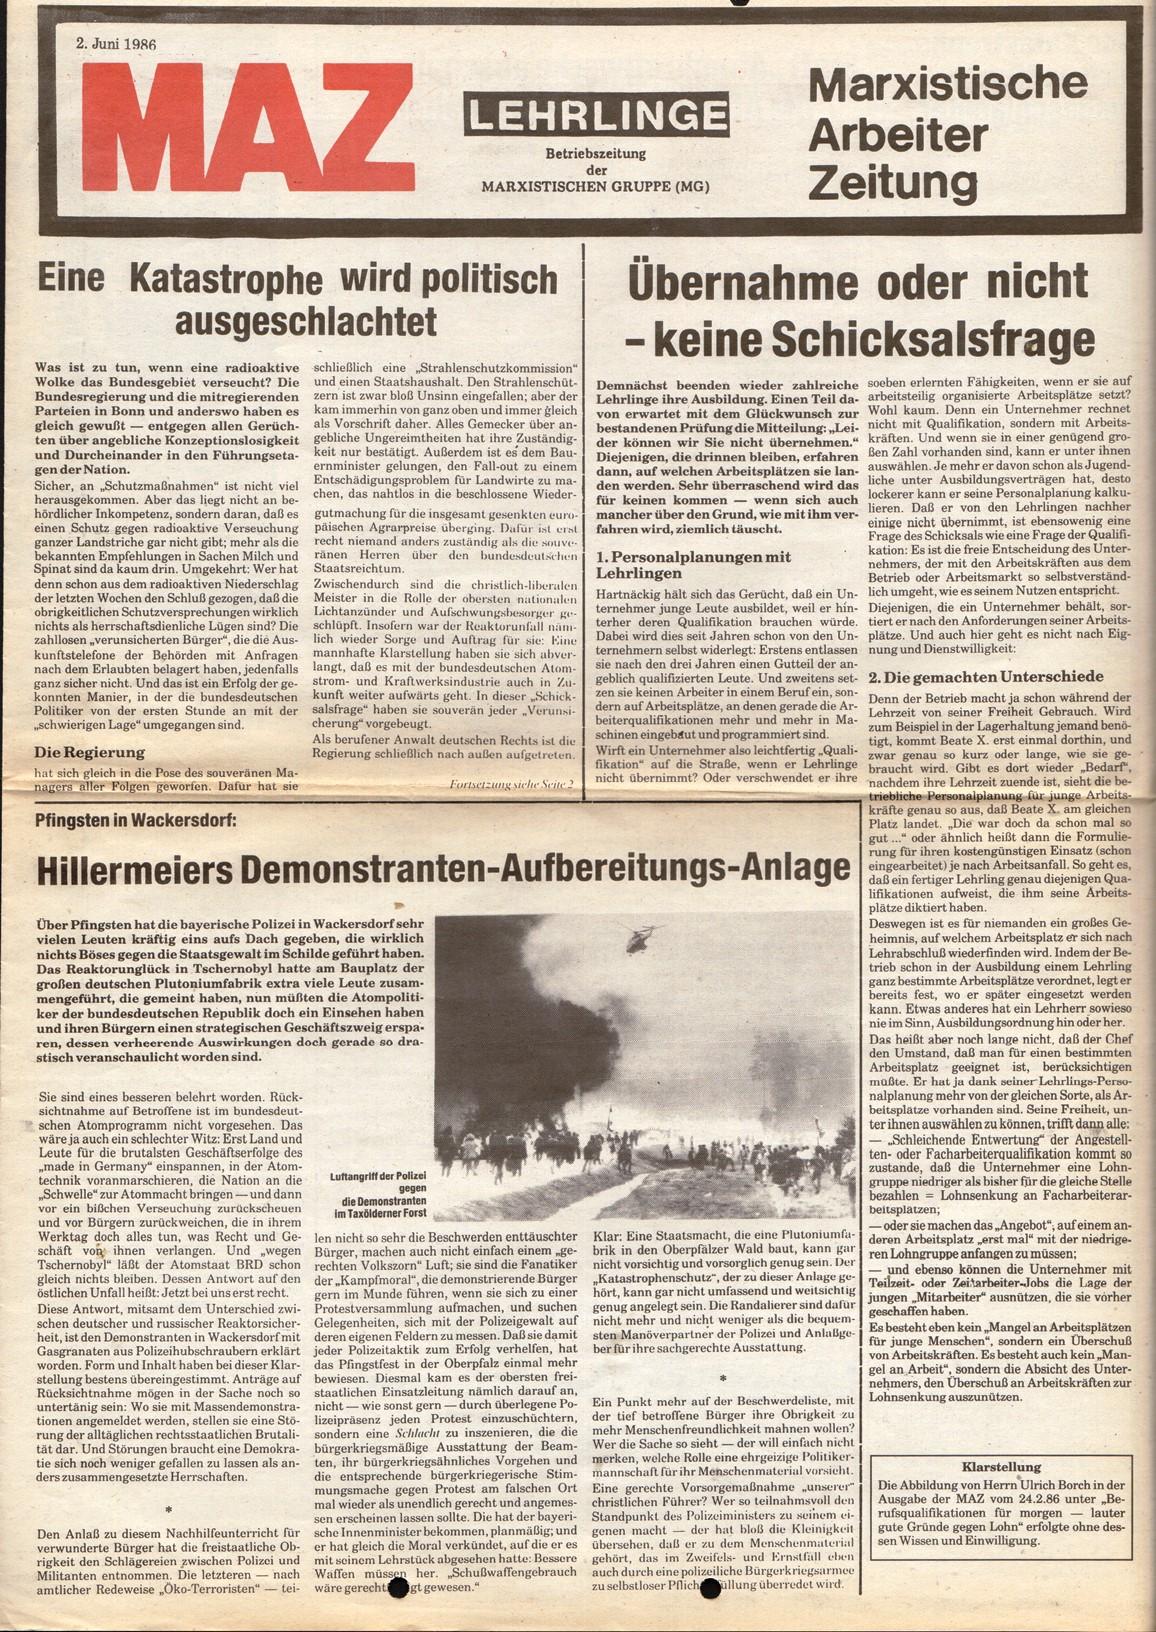 Muenchen_MG_MAZ_Lehrlinge_19860602_01